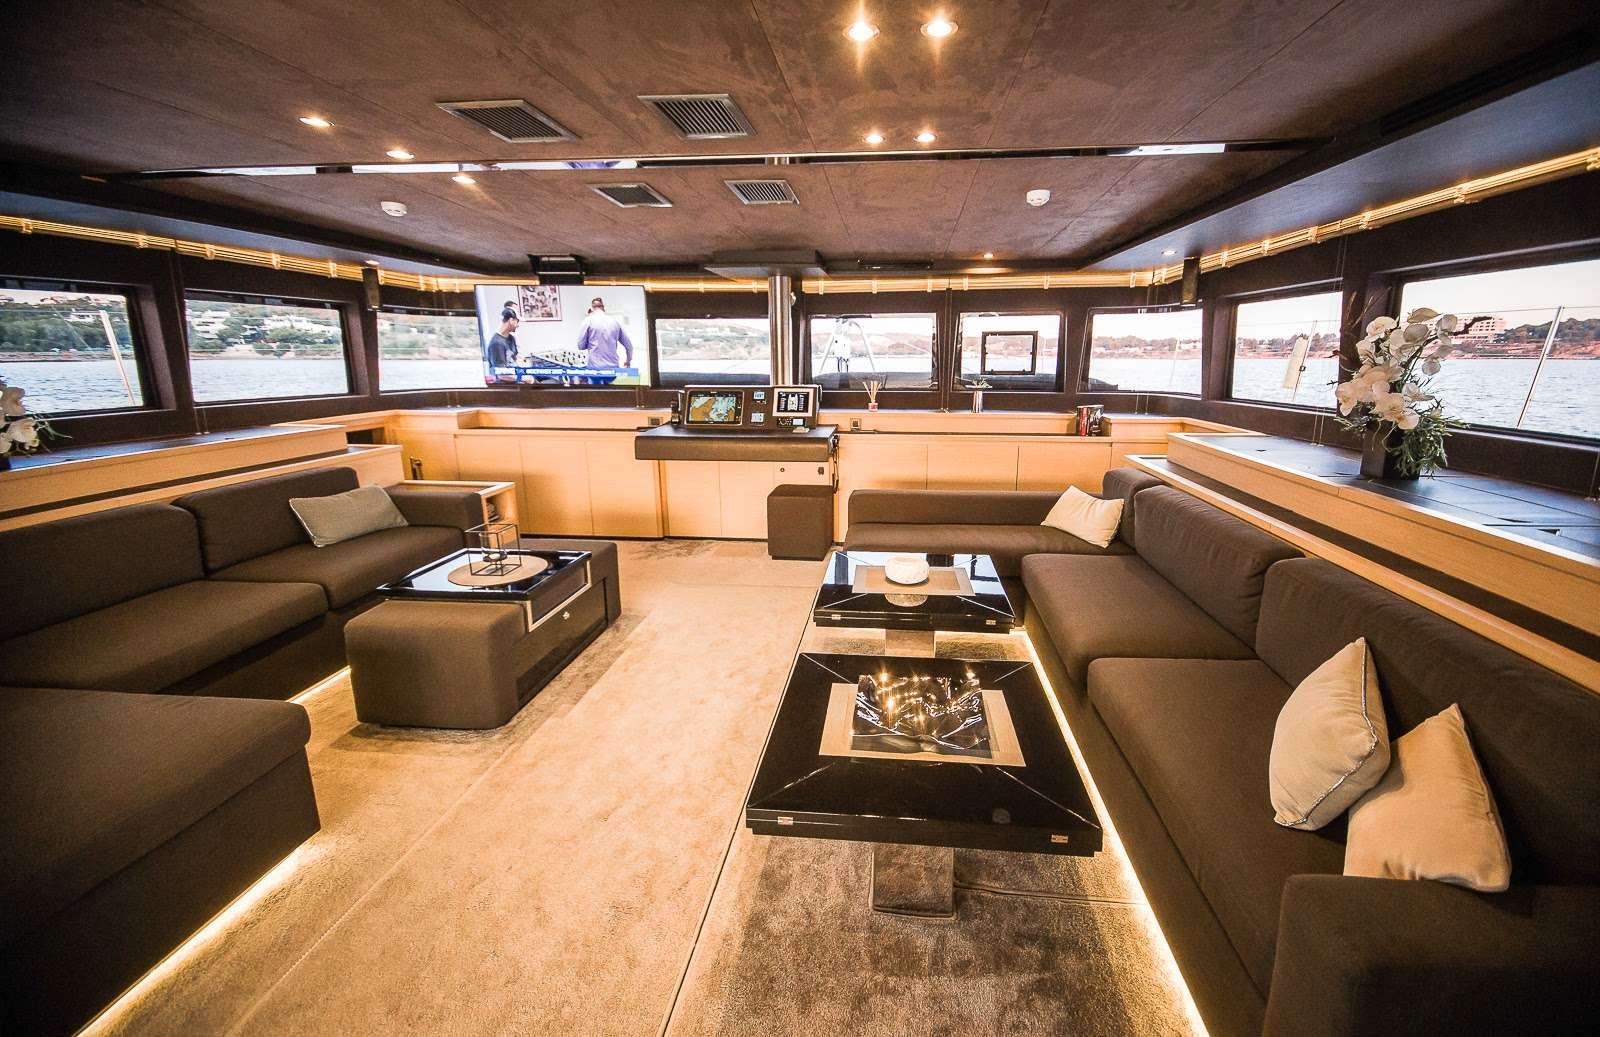 Cat Yacht 'Cat', 8 PAX, 3 Crew, 62.00 Ft, 18.00 Meters, Built 2016, Lagoon, Refit Year